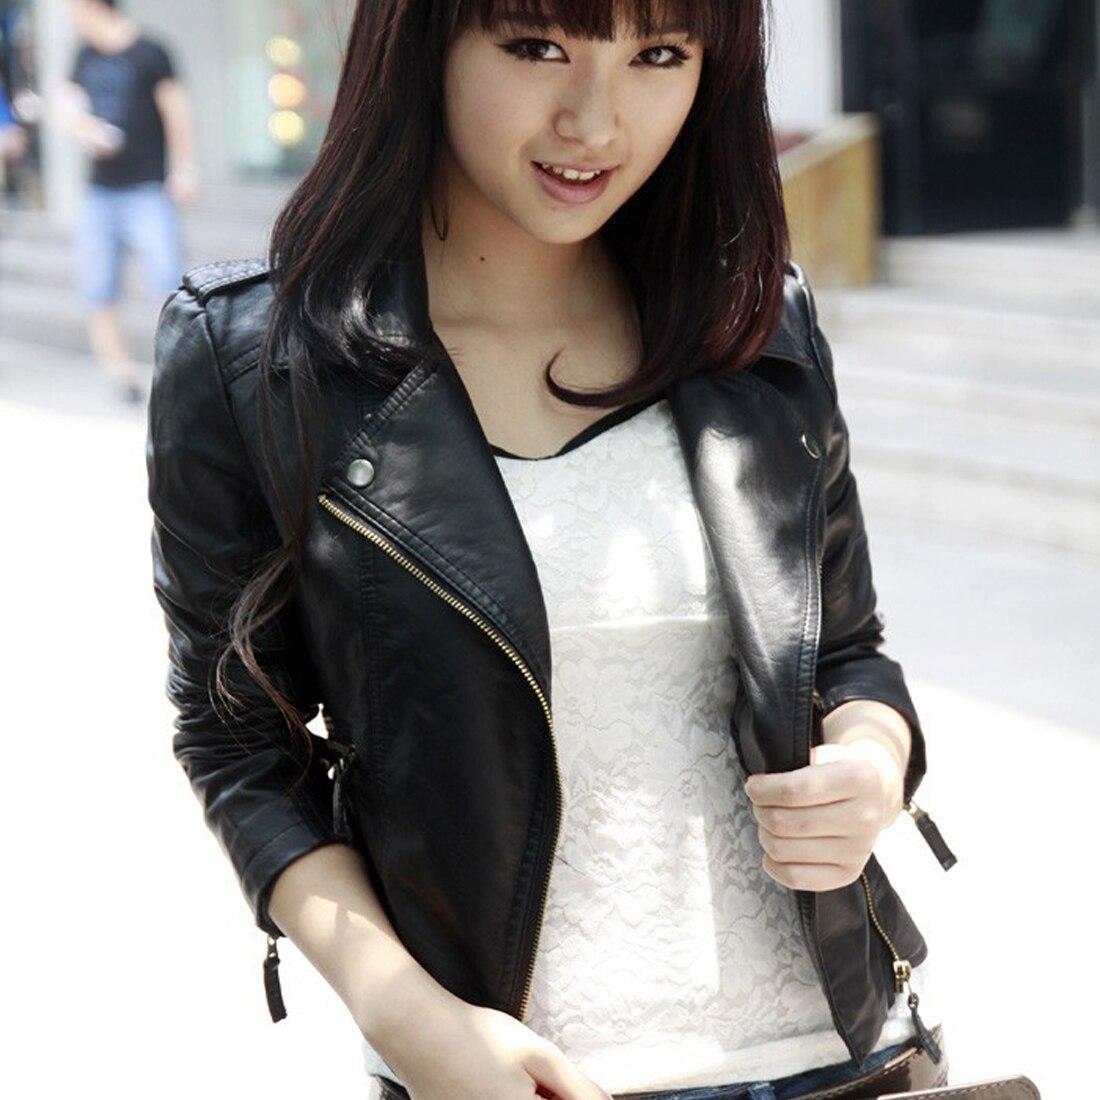 Classic Black PU Leather Jacket Women Cool Slim Short Motorcycle Jackets Ladies Autumn Zipper Coat Basic Outerwear Top casaco